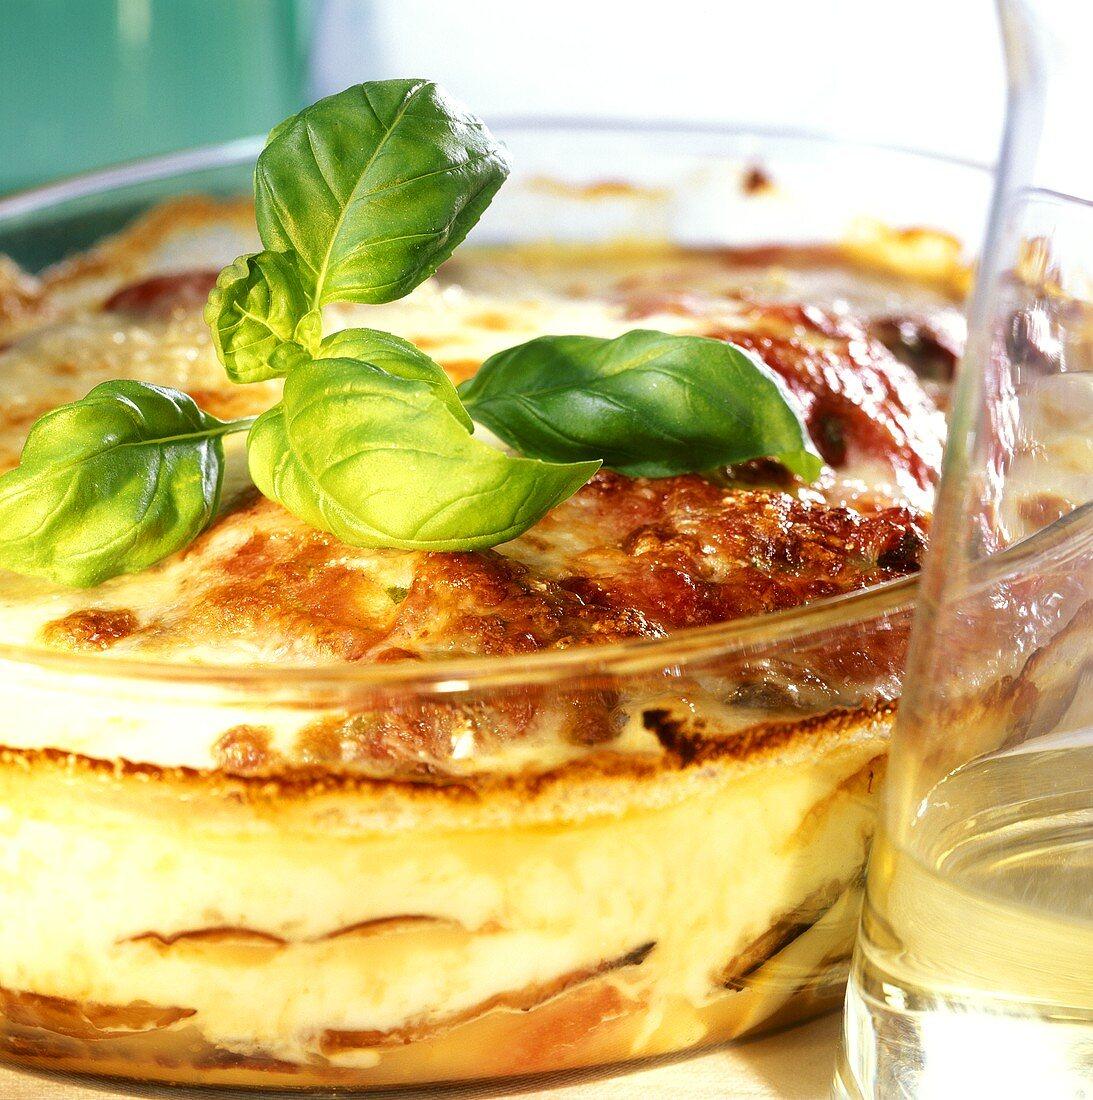 Parmigiana di melanzane (aubergine gratin with cheese, Italy)